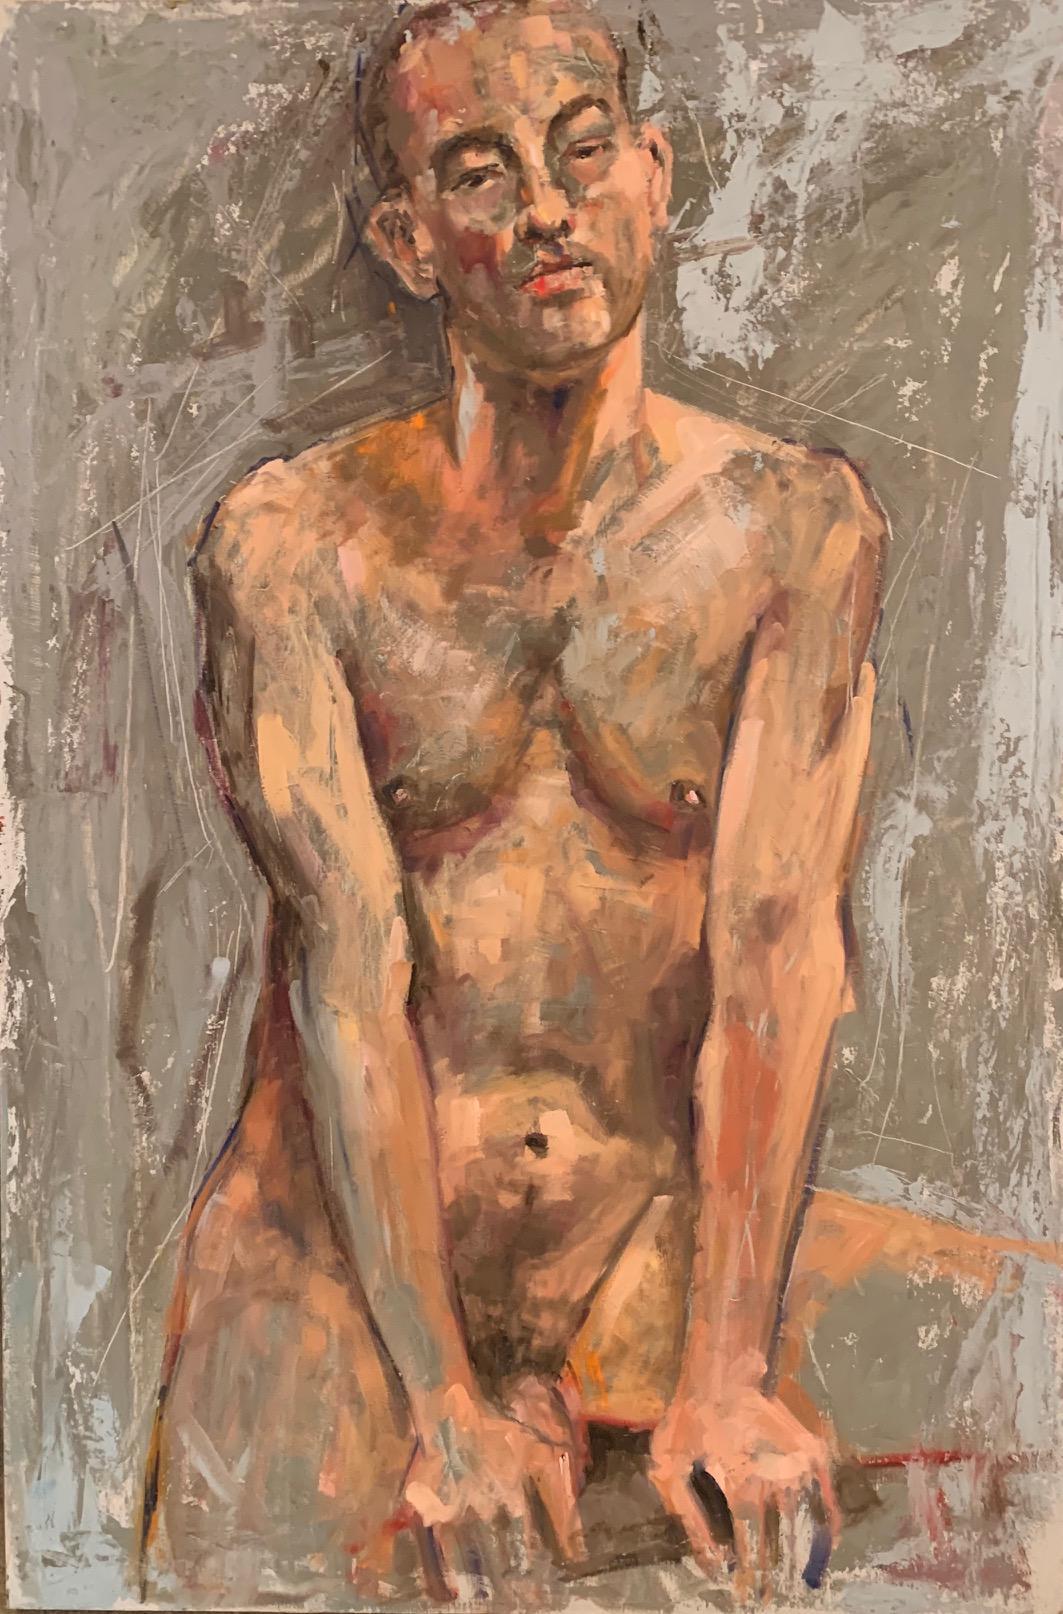 'Male Figure Nude' oil on canvass by Shana Wilson